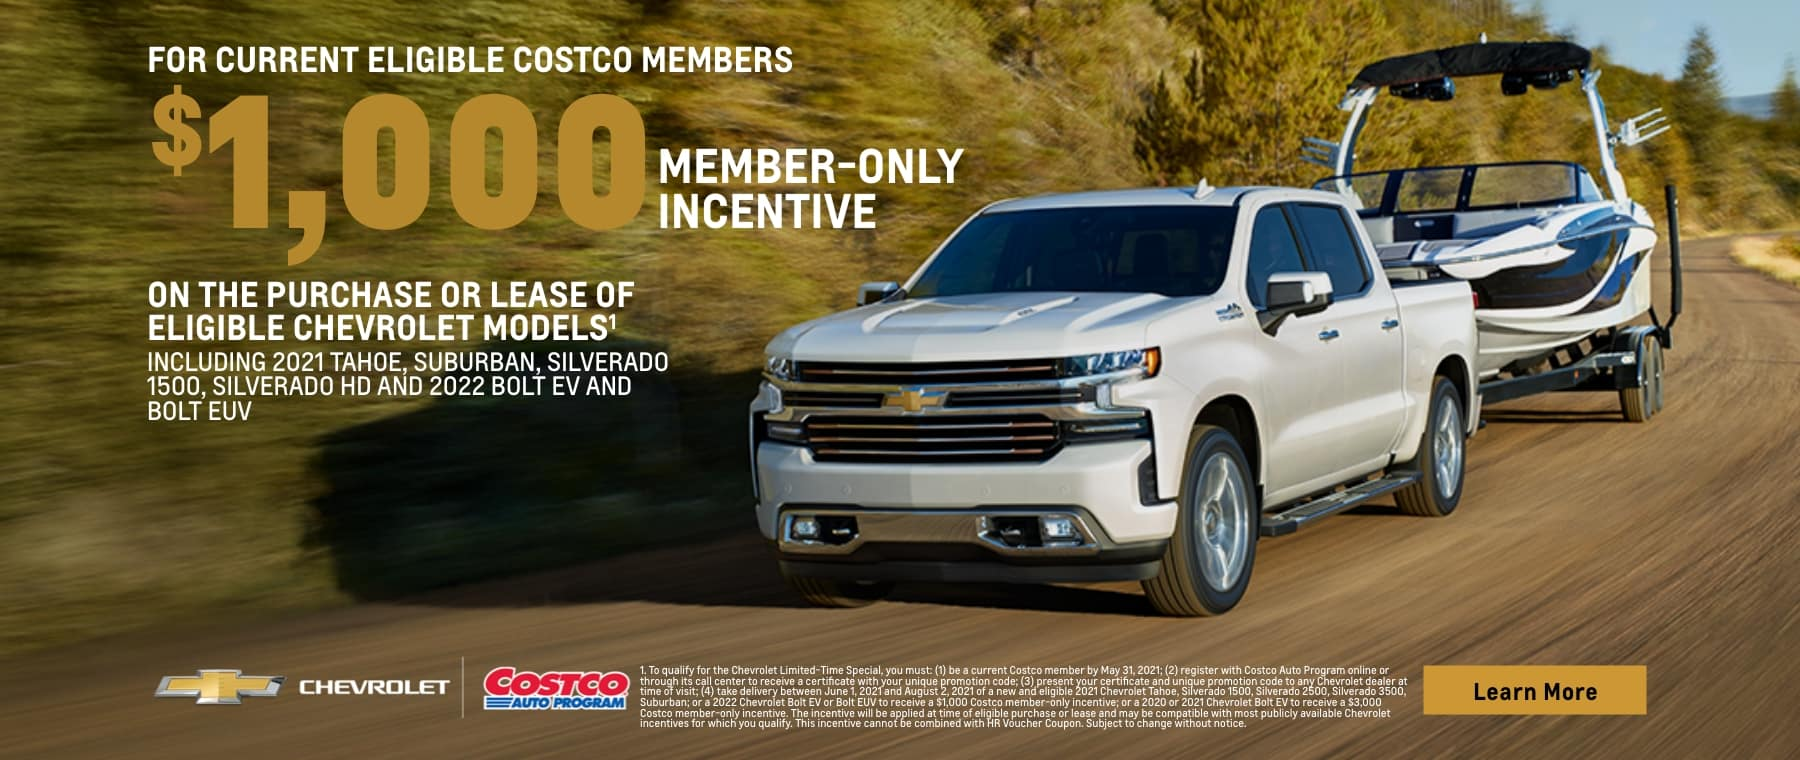 silverado 1500 offer